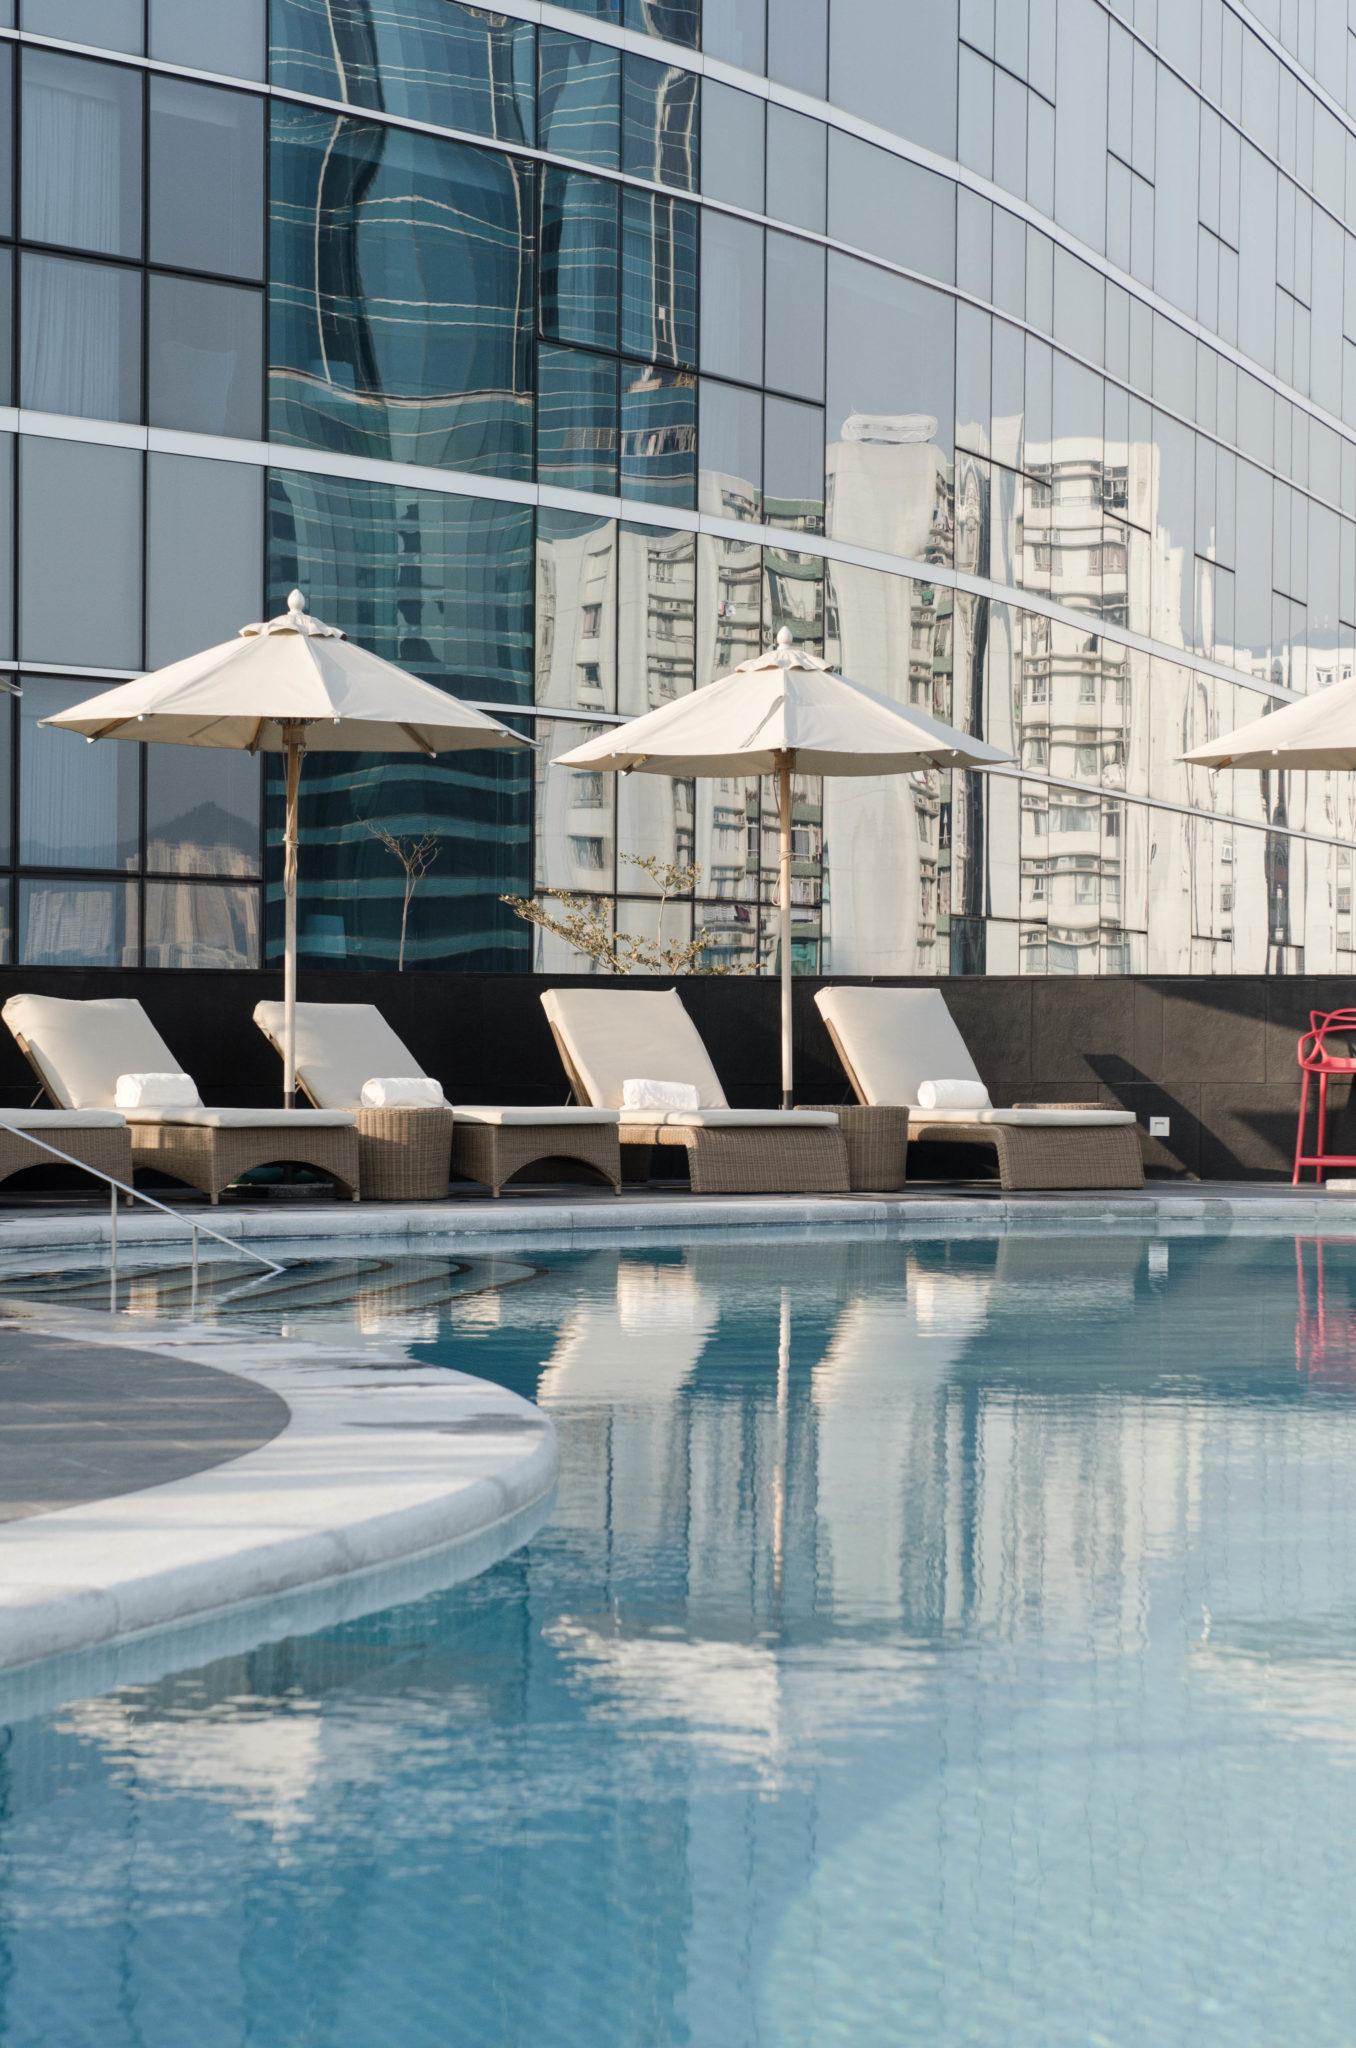 Im Pool des Kerry Hotel Hong Kong kann man sich entspannen.